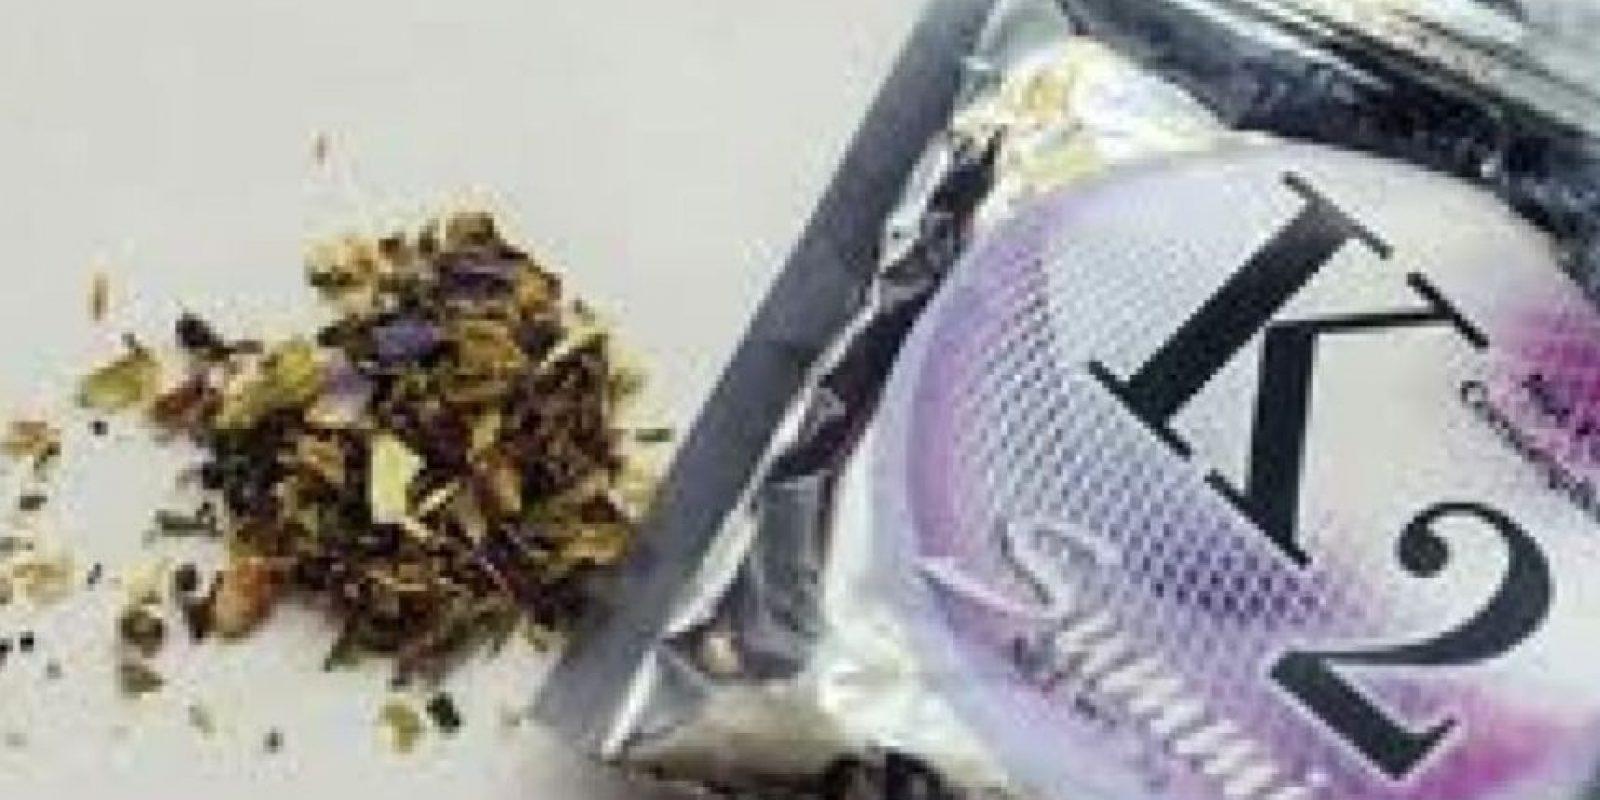 La droga Spice se vende como una sustancia natural Foto:SpaceIntelligence